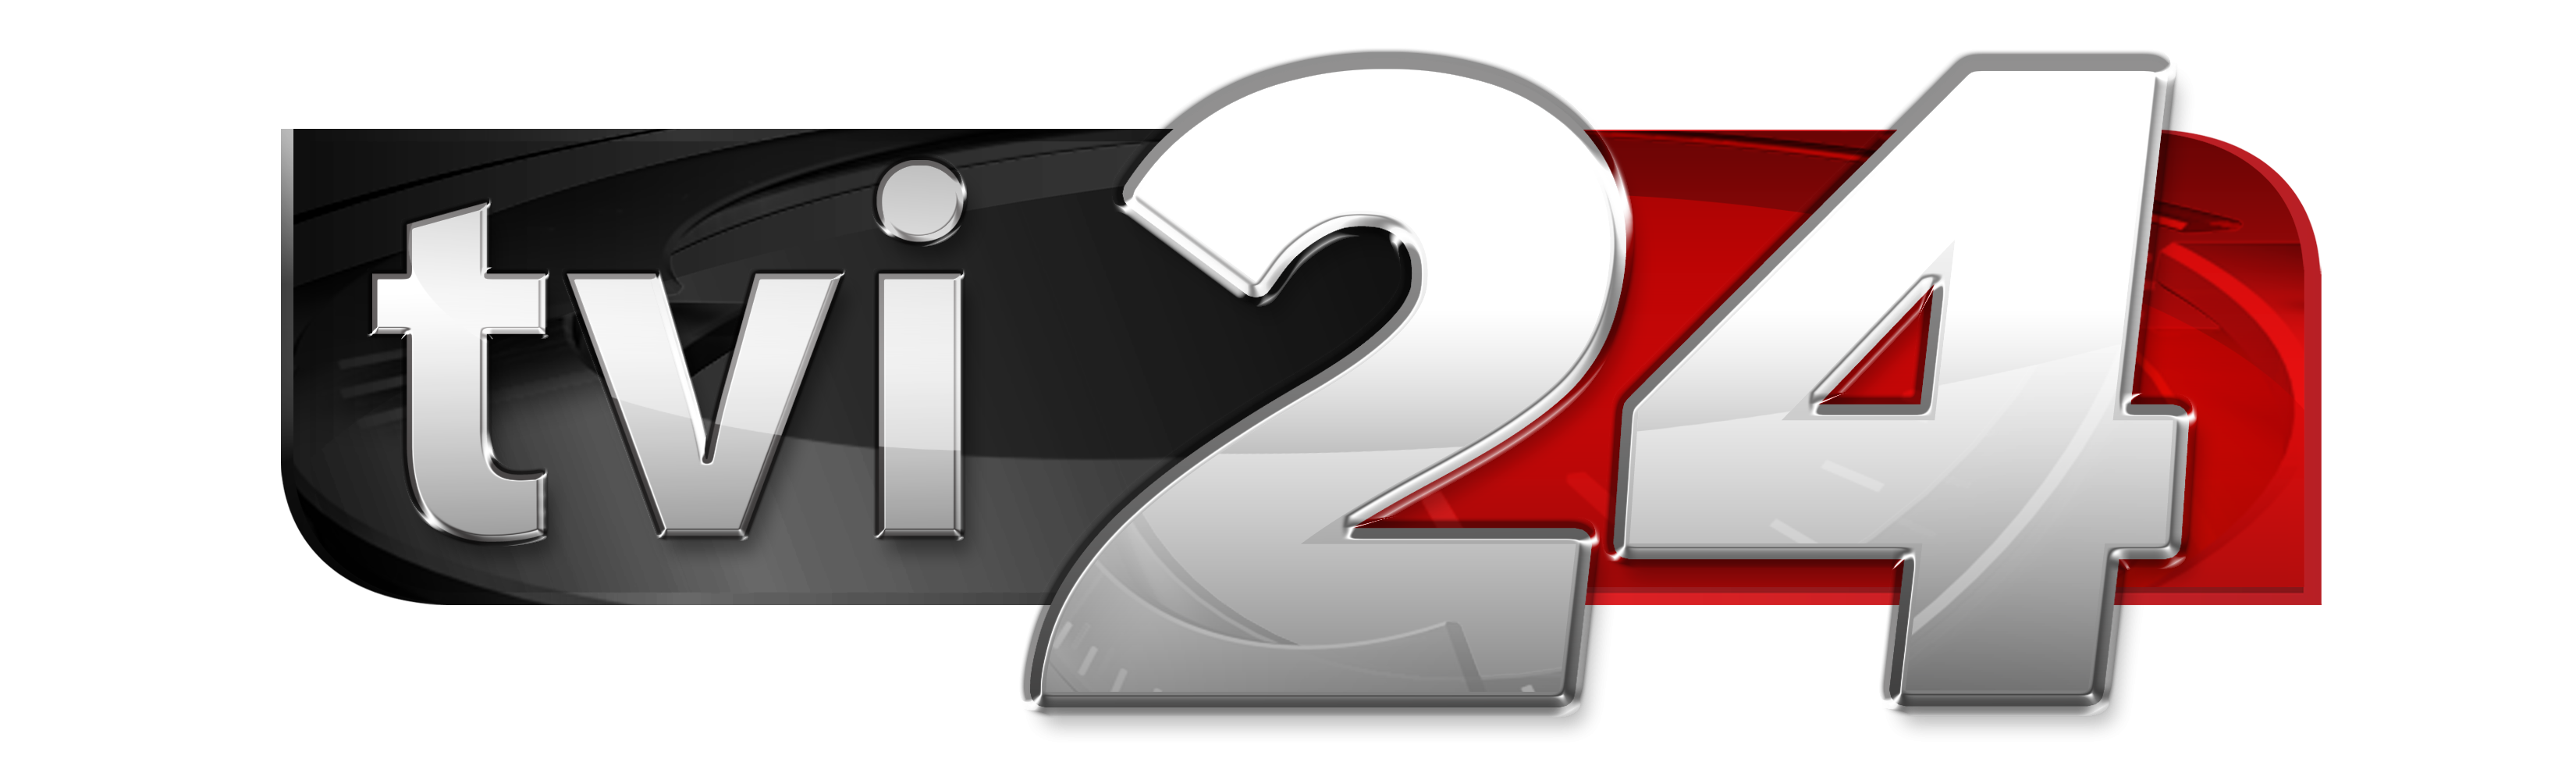 Agosto de 2015 - TVI24 volta a liderar no prime time